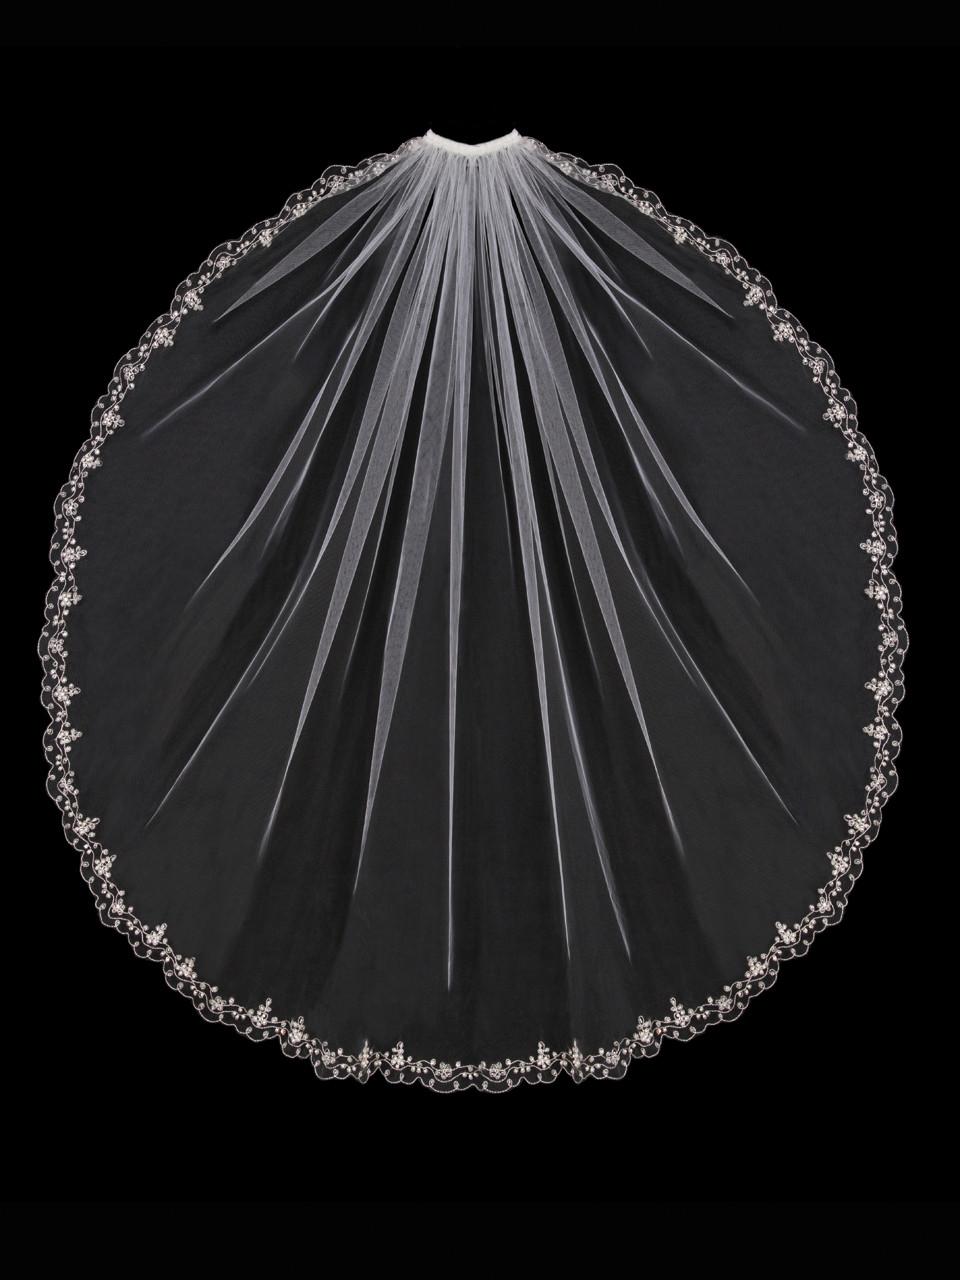 bridal veil jewish singles Jewish in the jewish faith,  why do brides wear veils bridal etiquette with veils prayer shawls at jewish weddings malay traditional wedding attire.